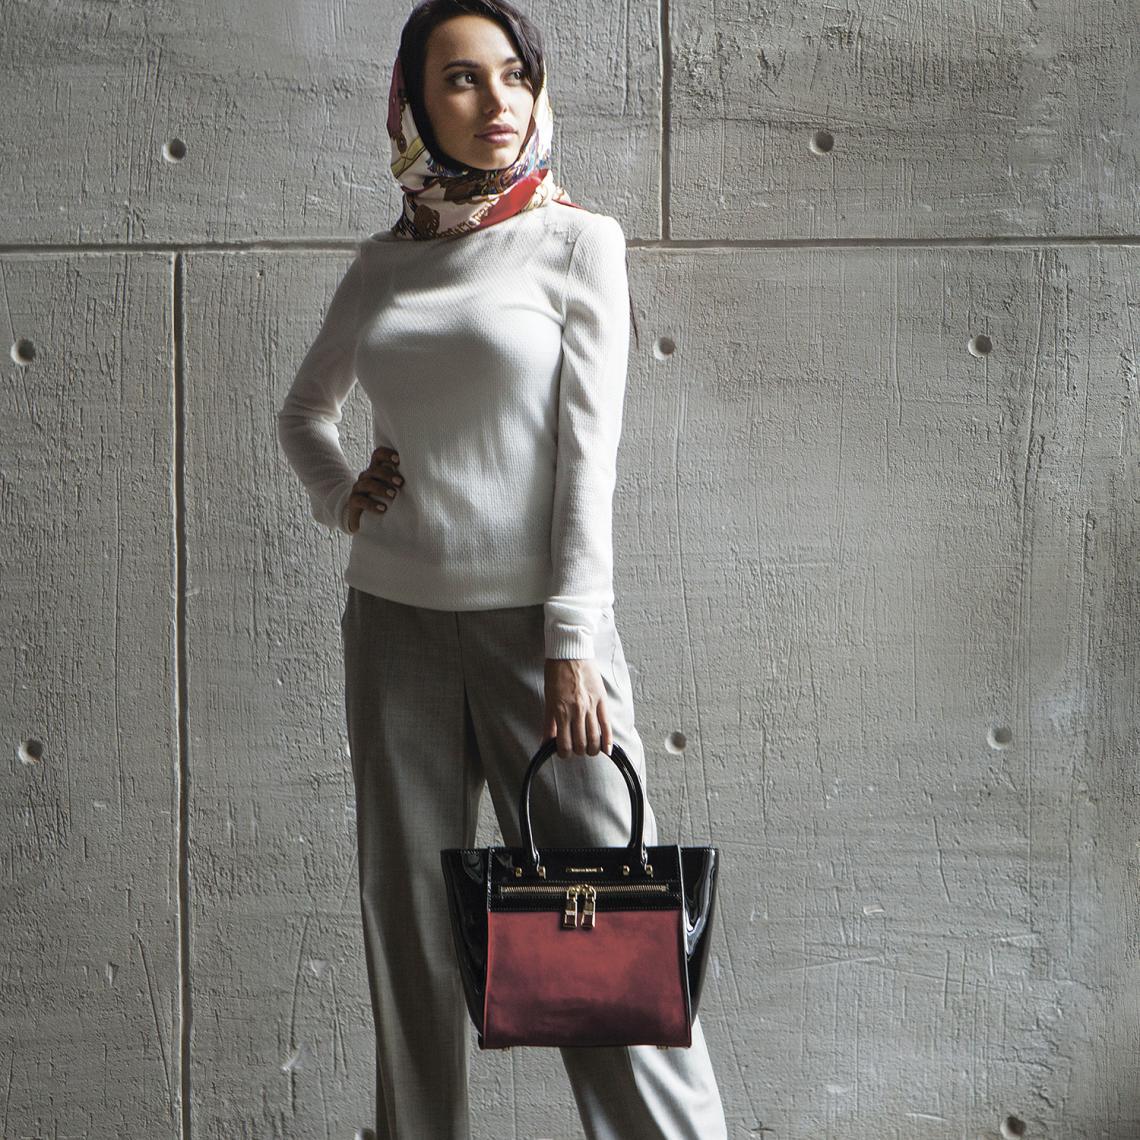 Бренды сумок Francesco marconi лаковая